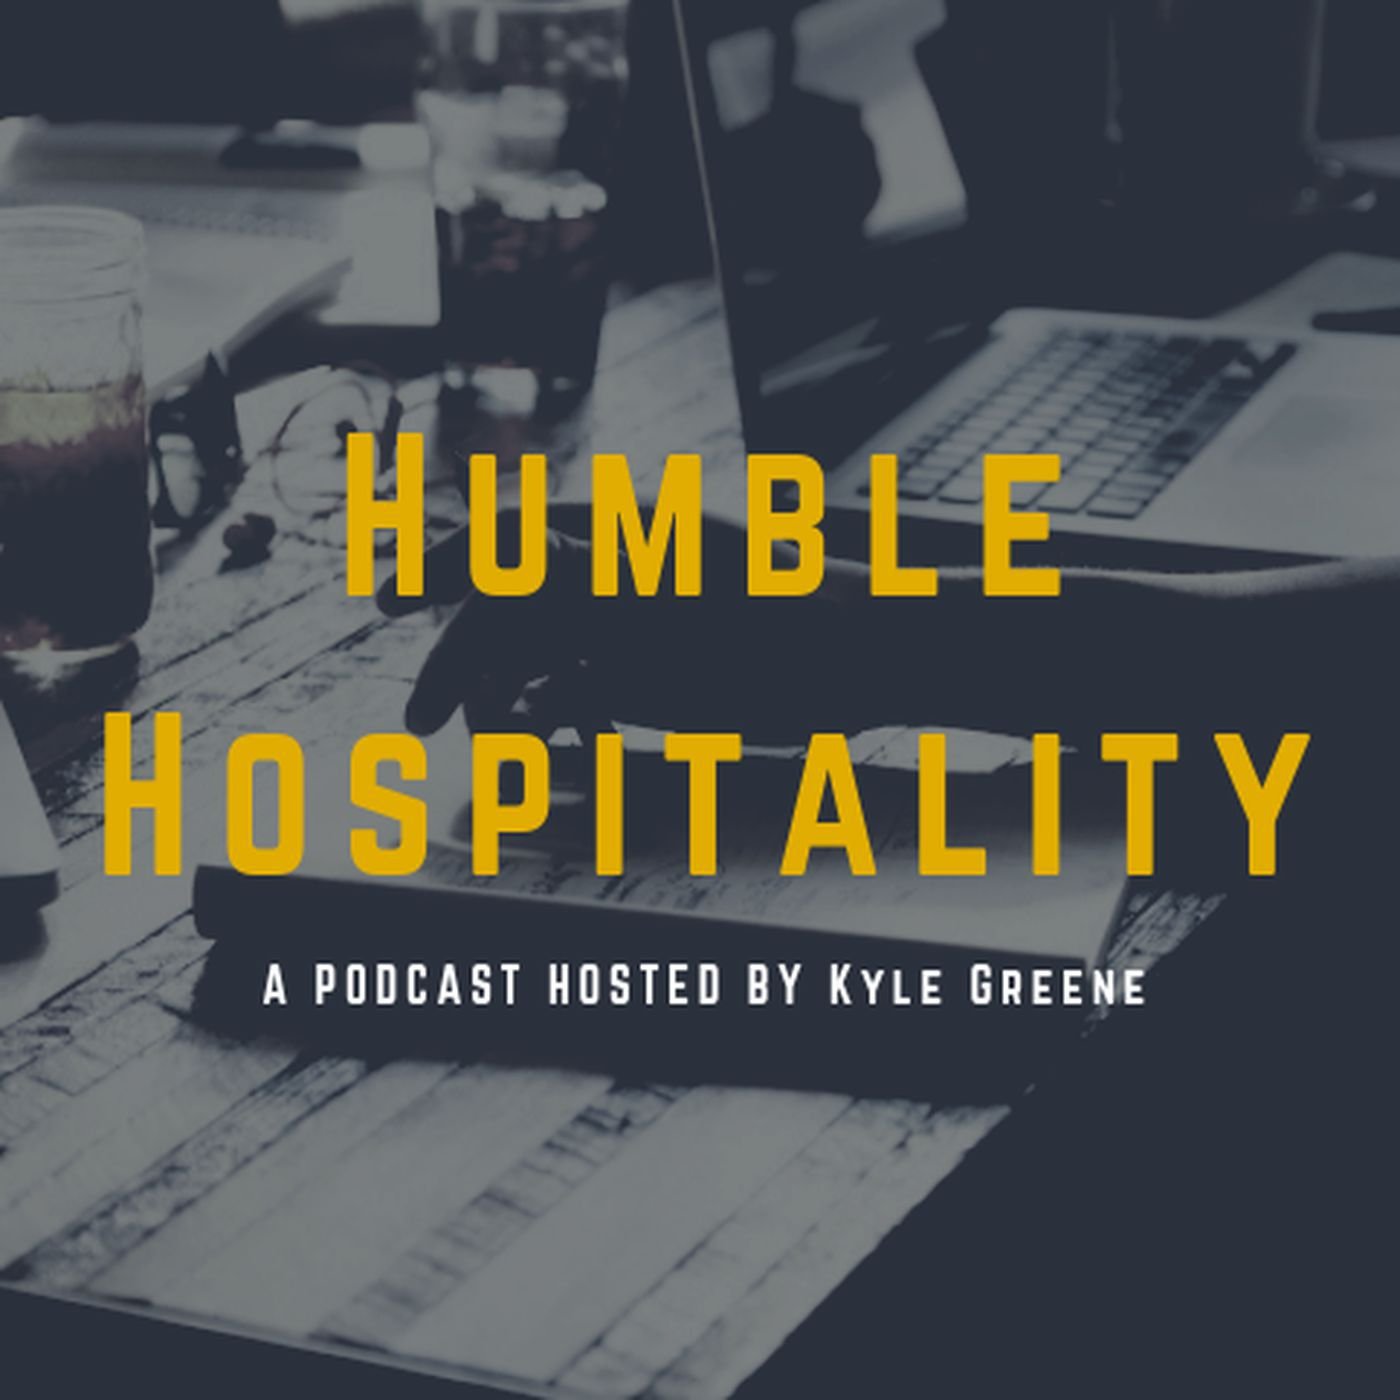 Kyle G's Humble Hospitality